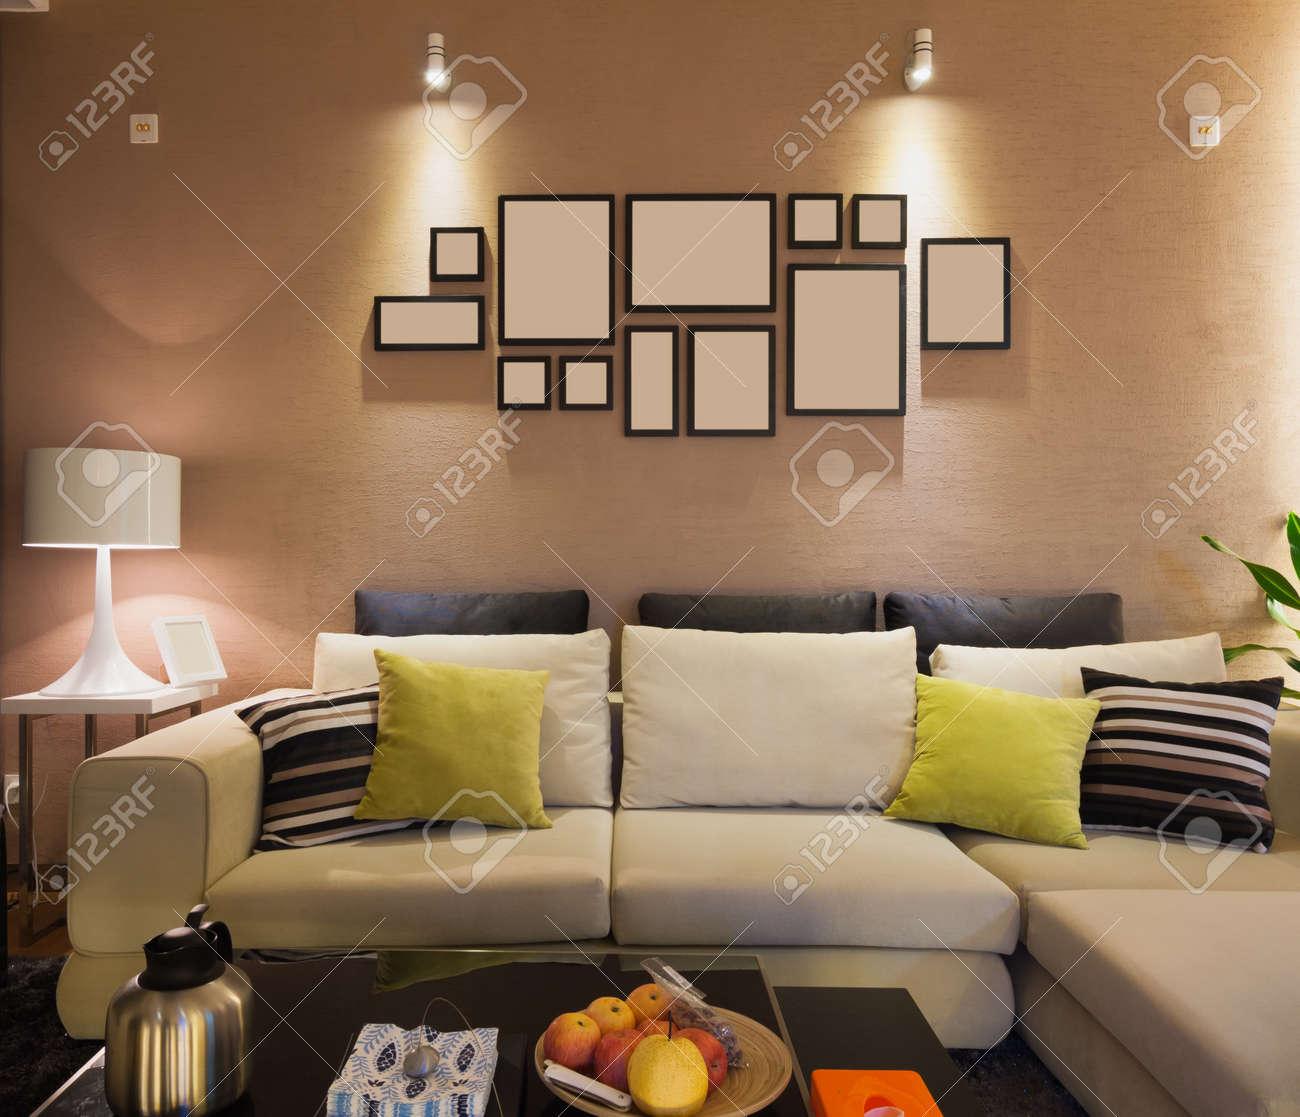 modern living room Standard-Bild - 20020386